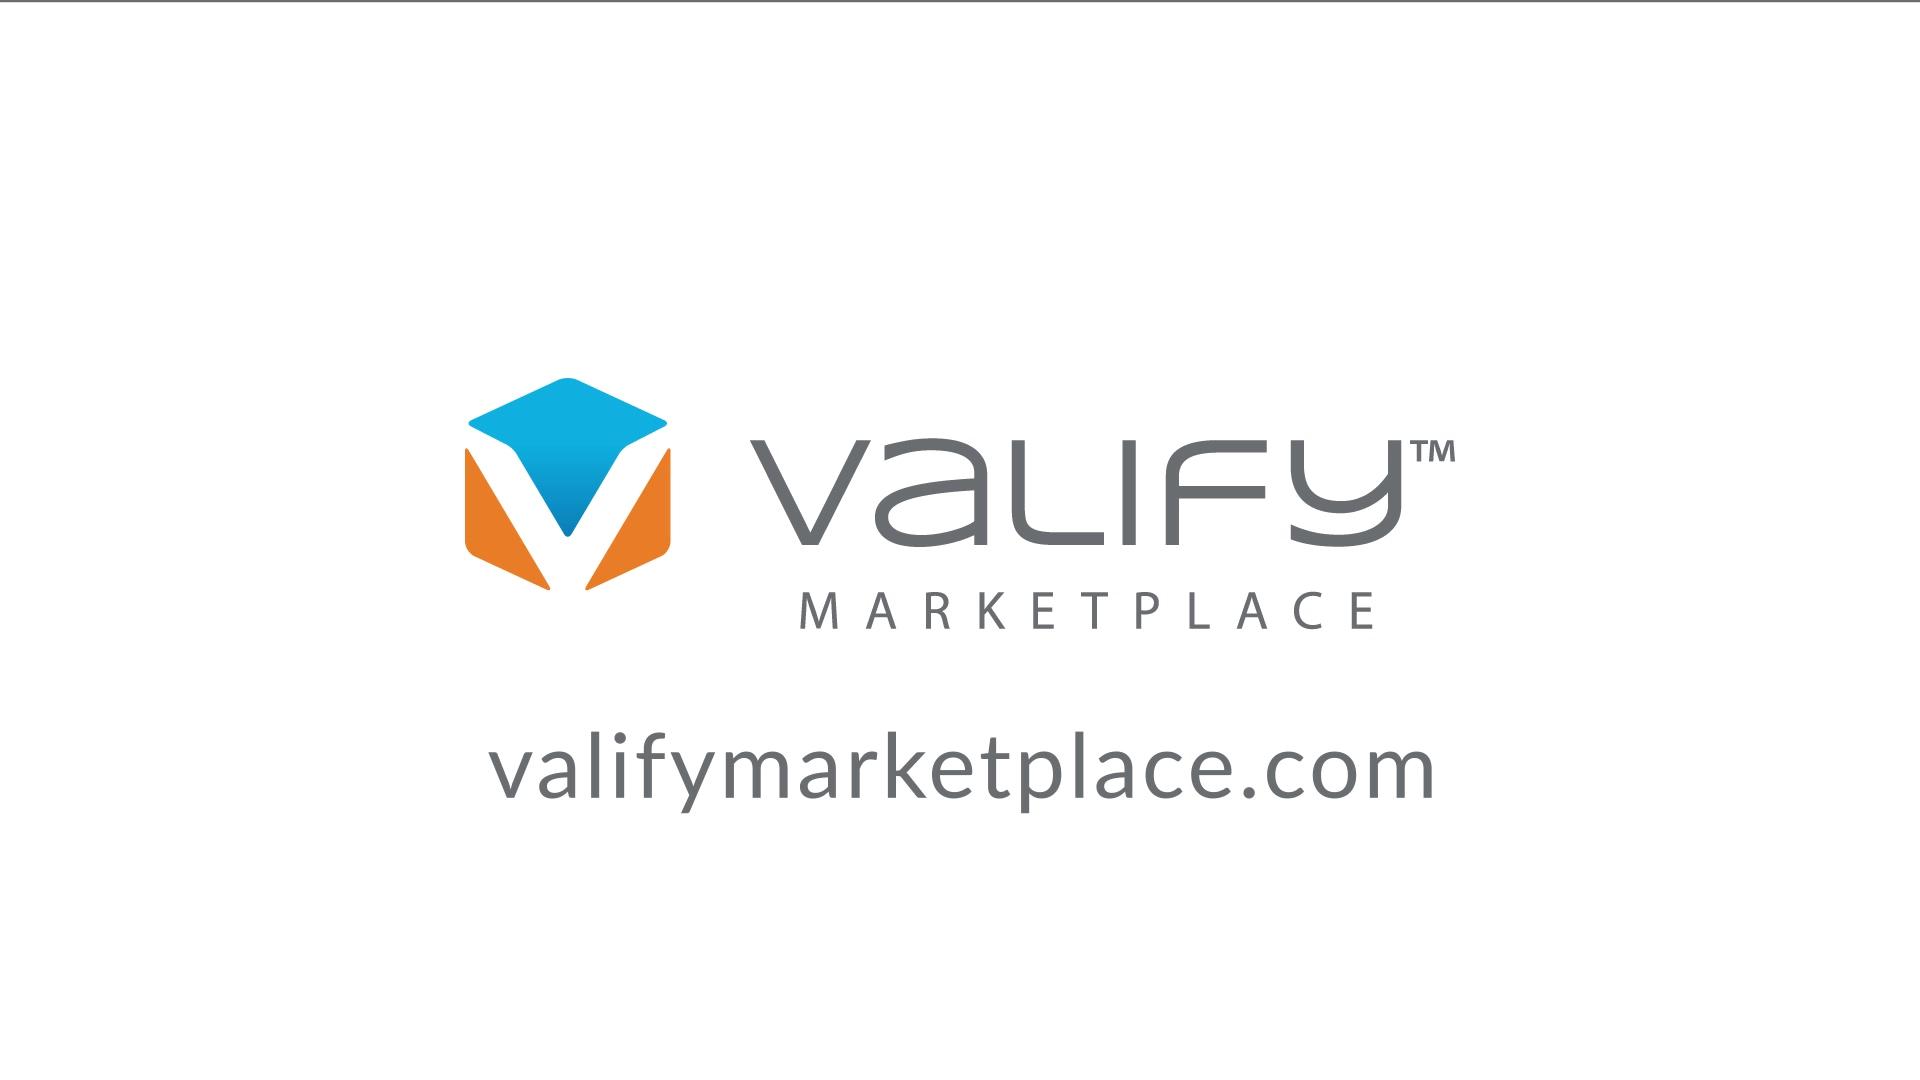 Valify_Marketplace